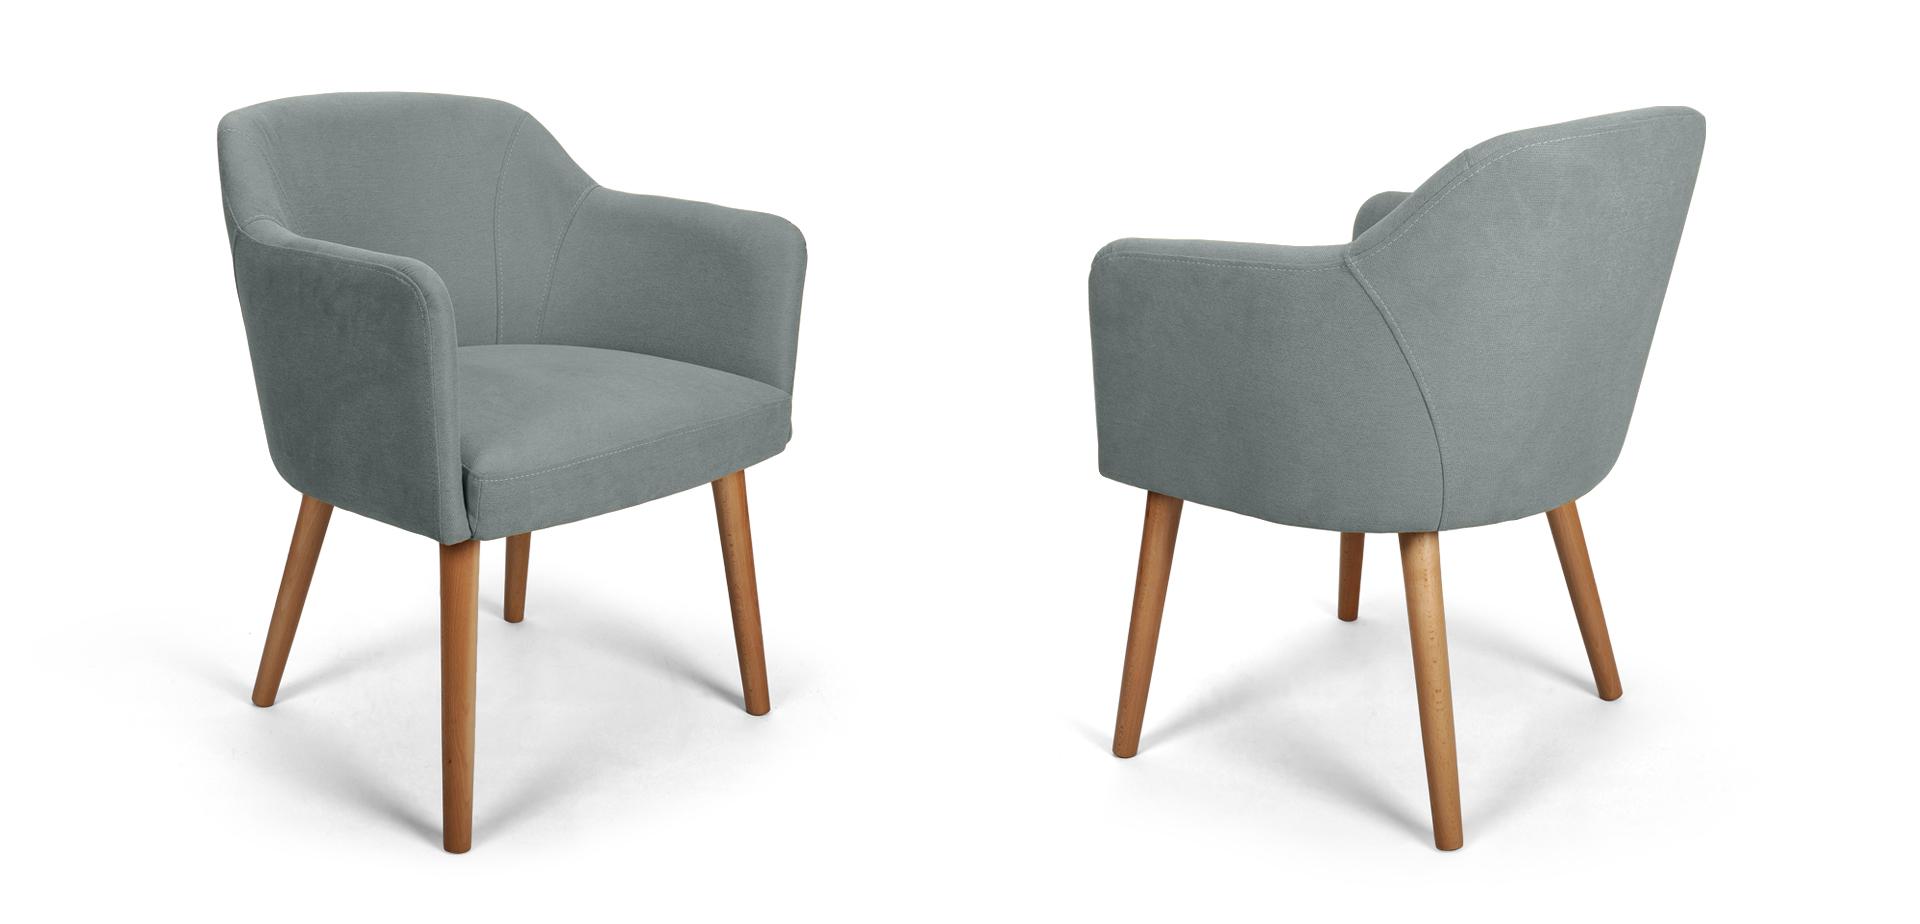 sofia-scaun-01.jpg